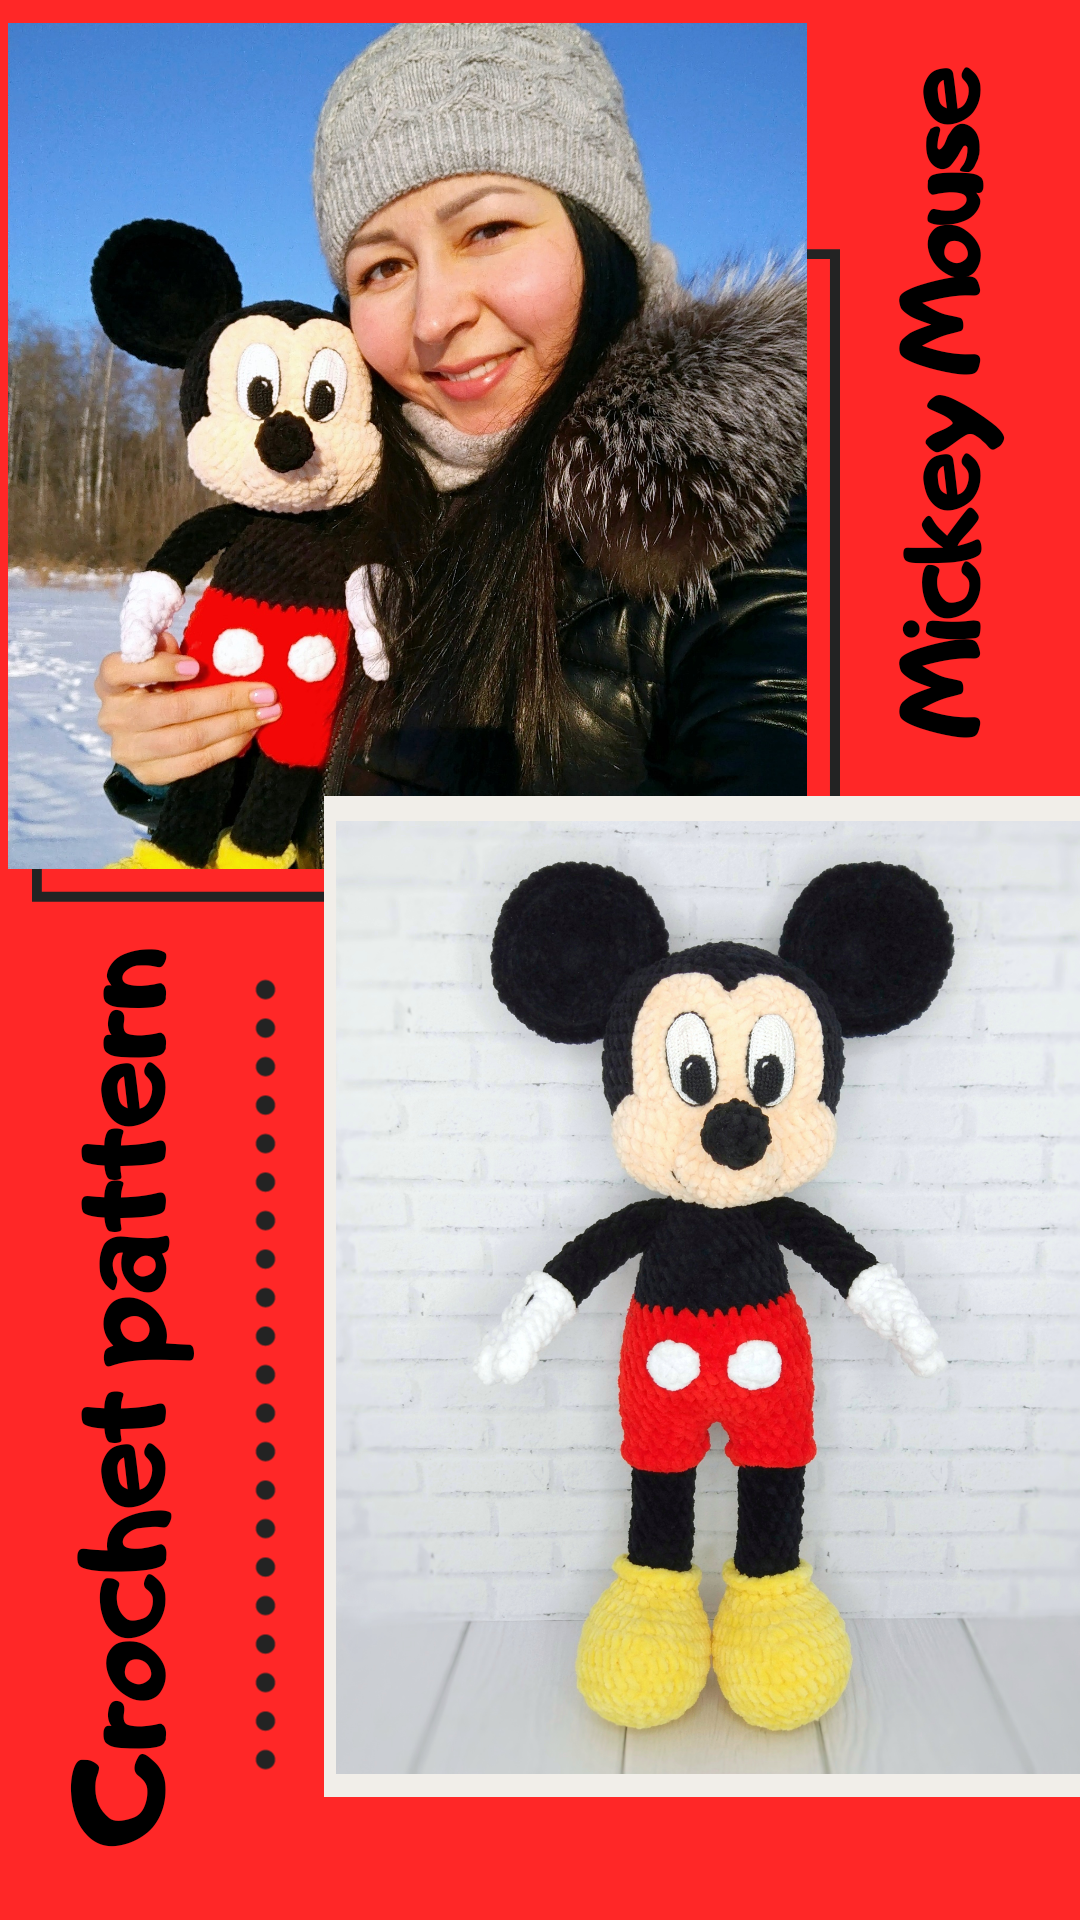 Amigurumi Crochet Mickey Mouse Patterns - Amigurumi Patterns Tutorials | 1920x1080